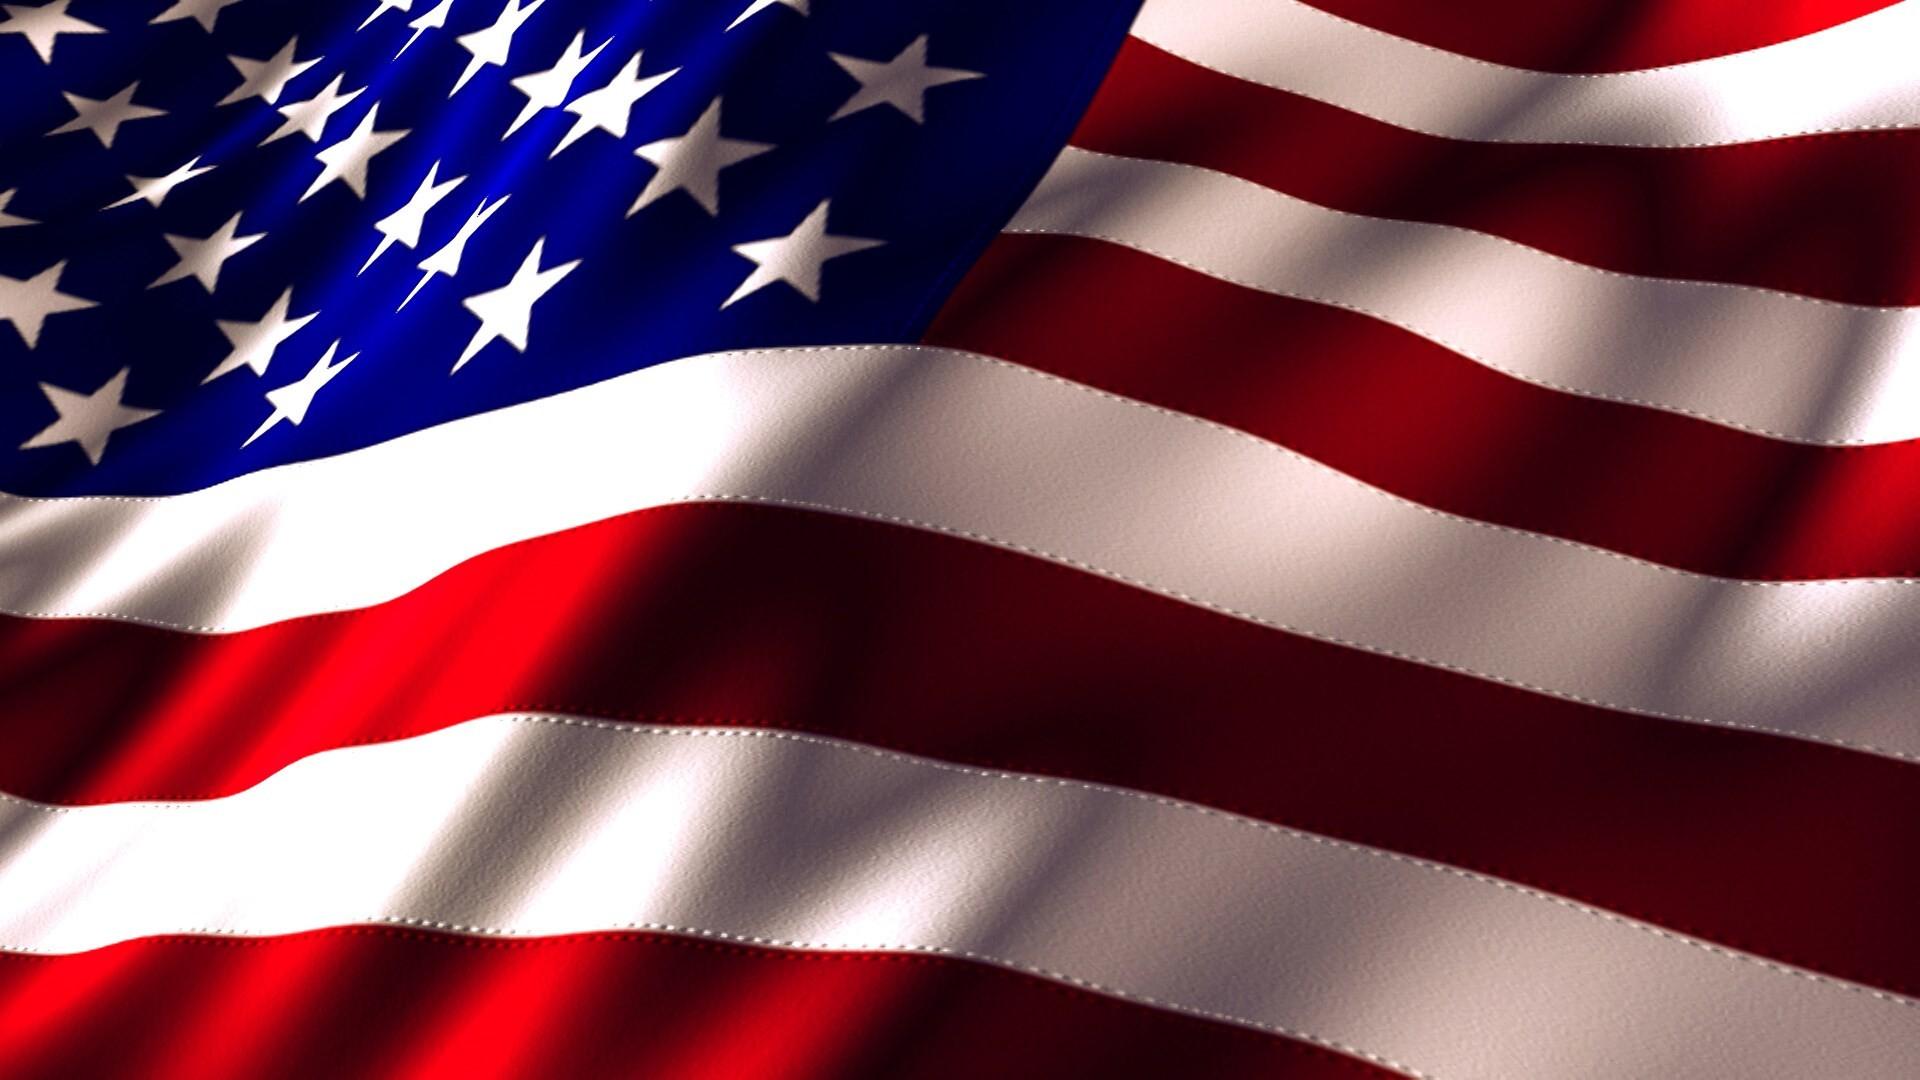 1920x1200 USA America Flag Eagle Wallpaper Background